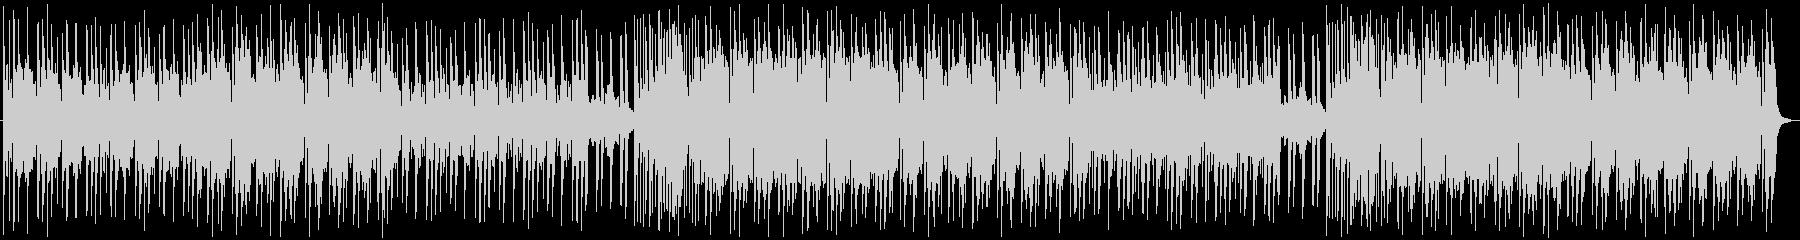 Kawaii FutureBass 02's unreproduced waveform